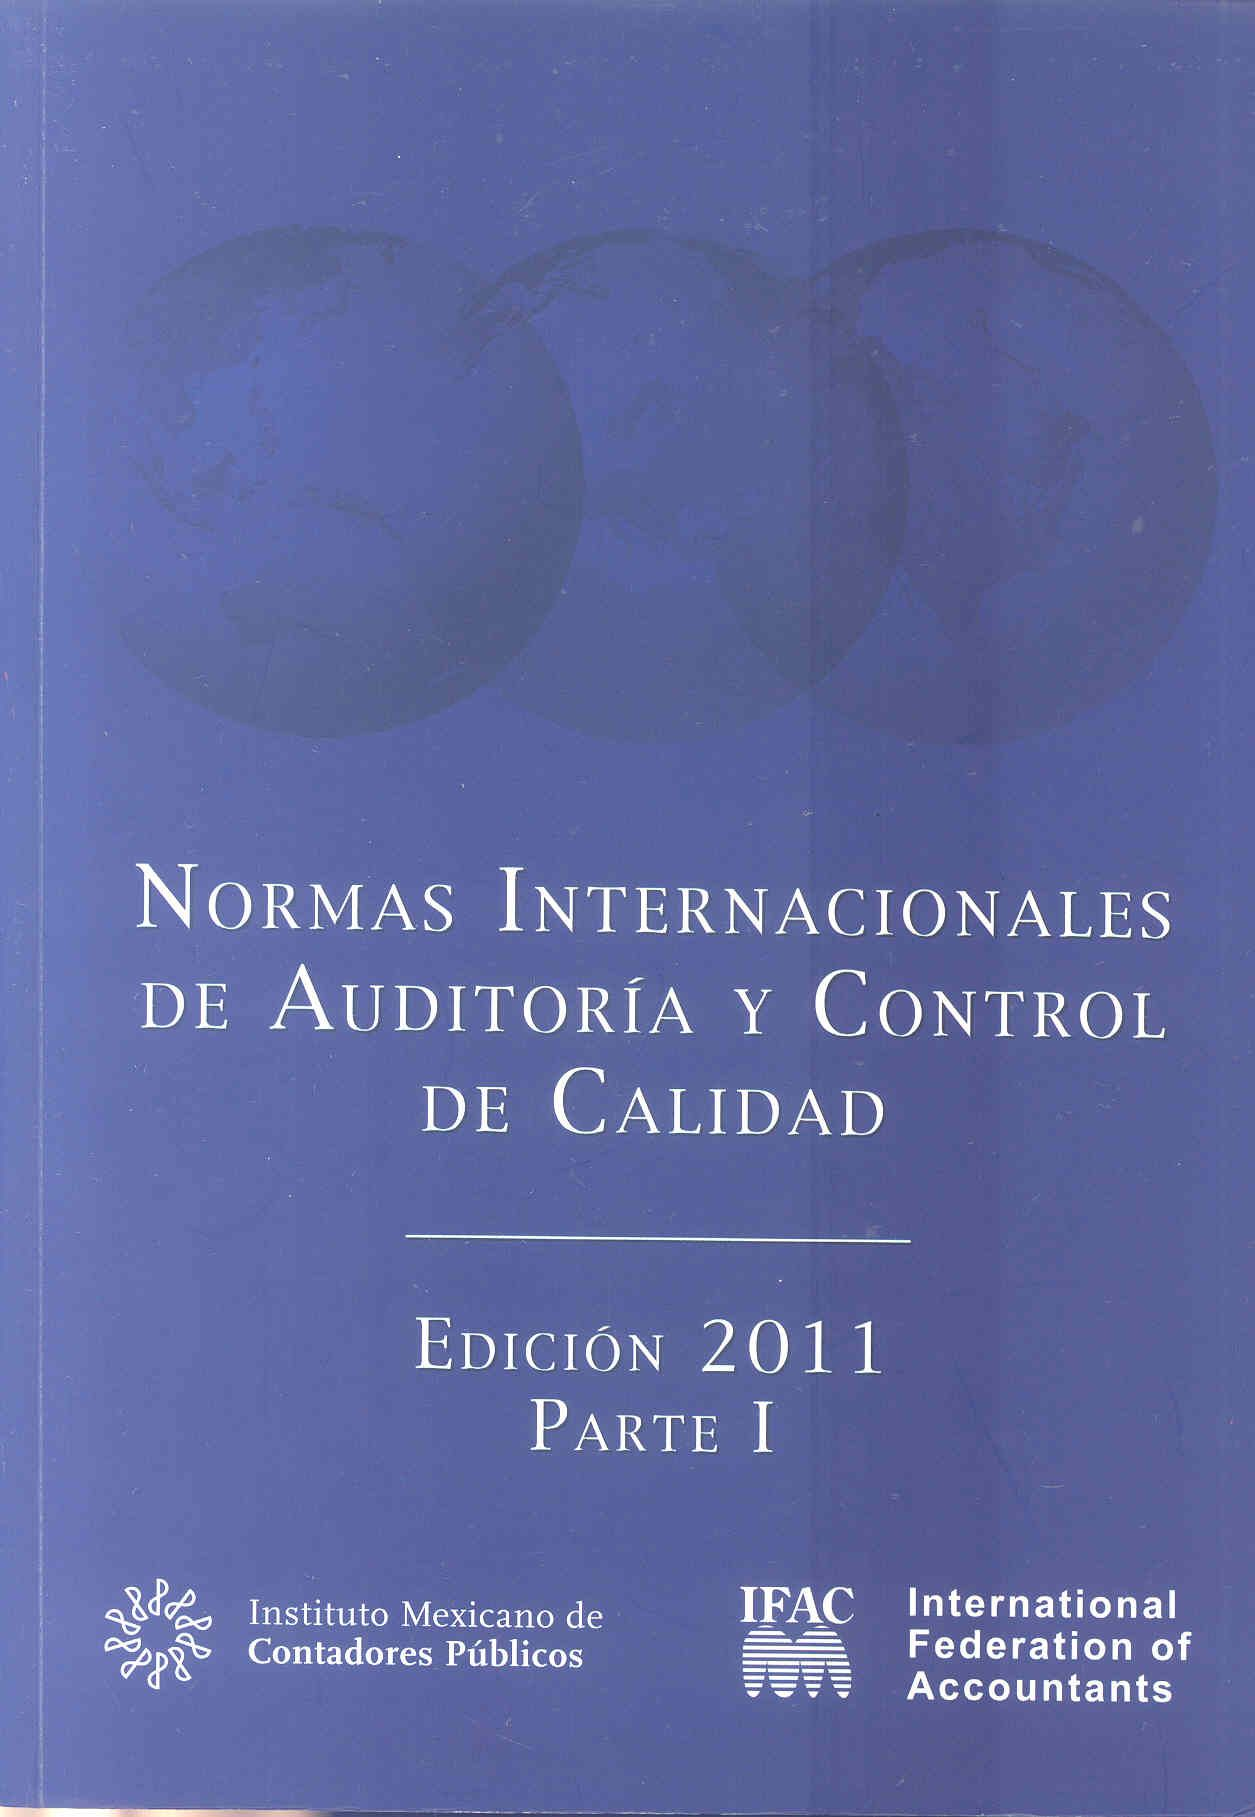 CONTABILIDAD (Buenos aires IFAC, 2012) Weather